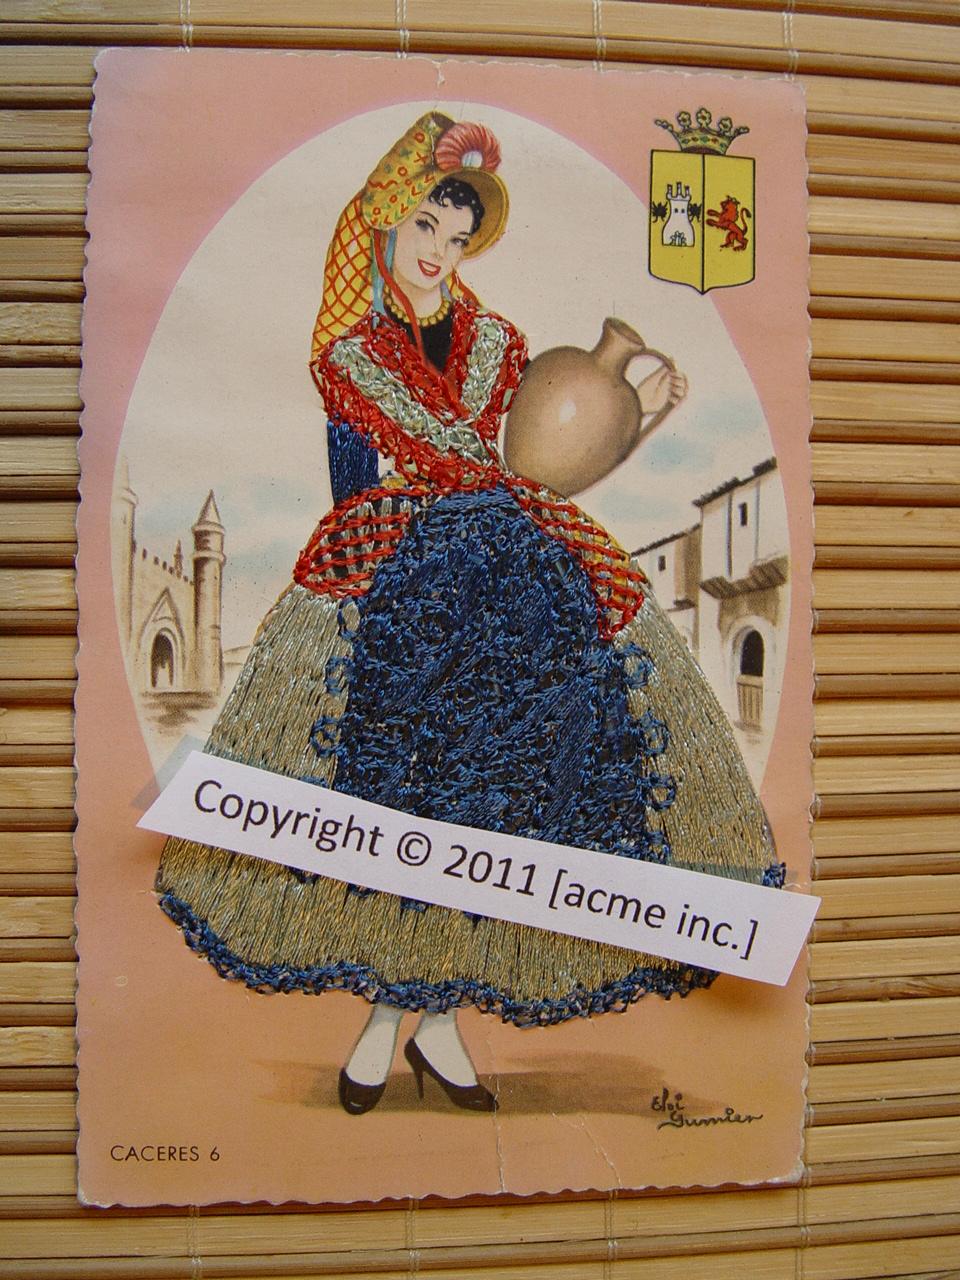 http://www.acme-inc.co.uk/greetingscards/DSC05446.jpg